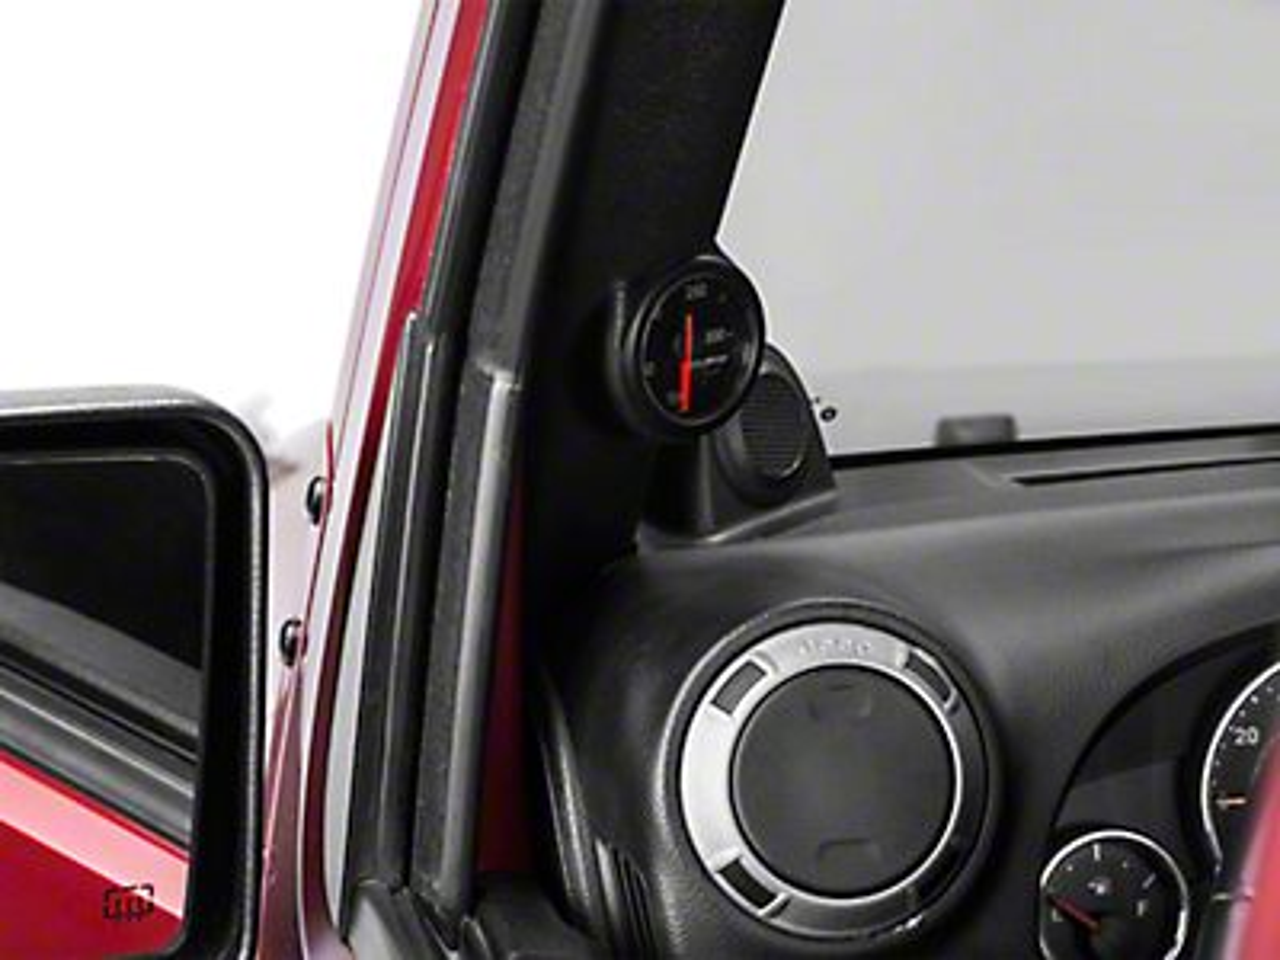 Auto Meter AirDrive Oil Temperature Gauge - Electrical (97-18 Wrangler TJ & JK)